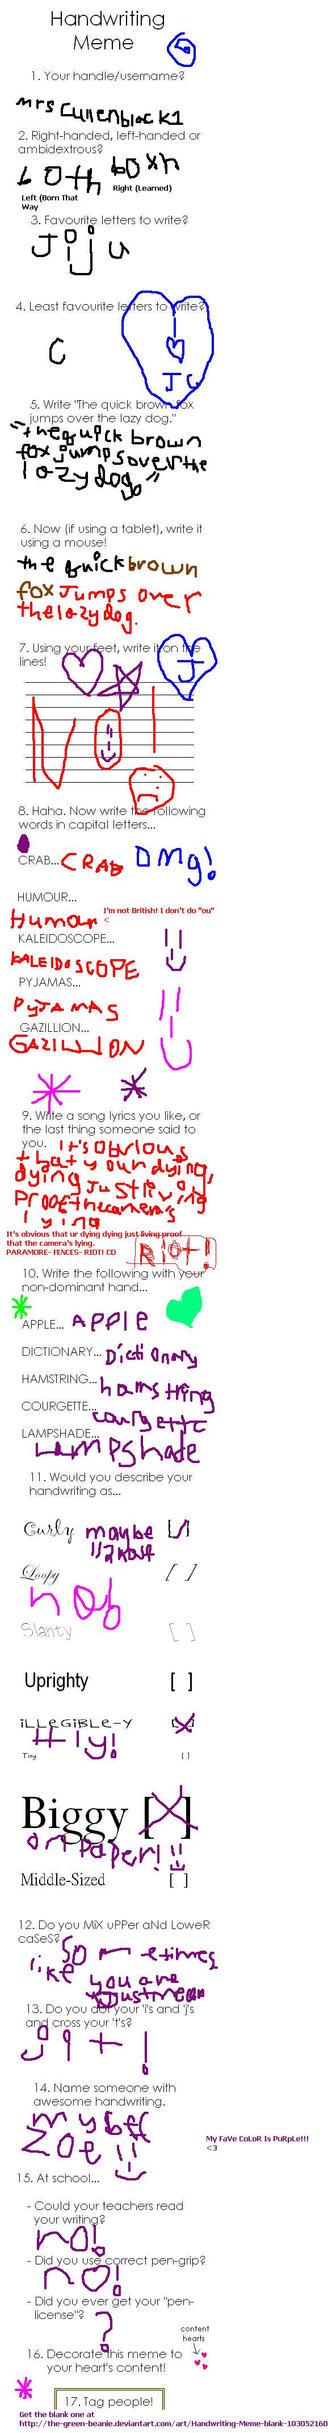 Handwriting MeMe by mrscullenblack1